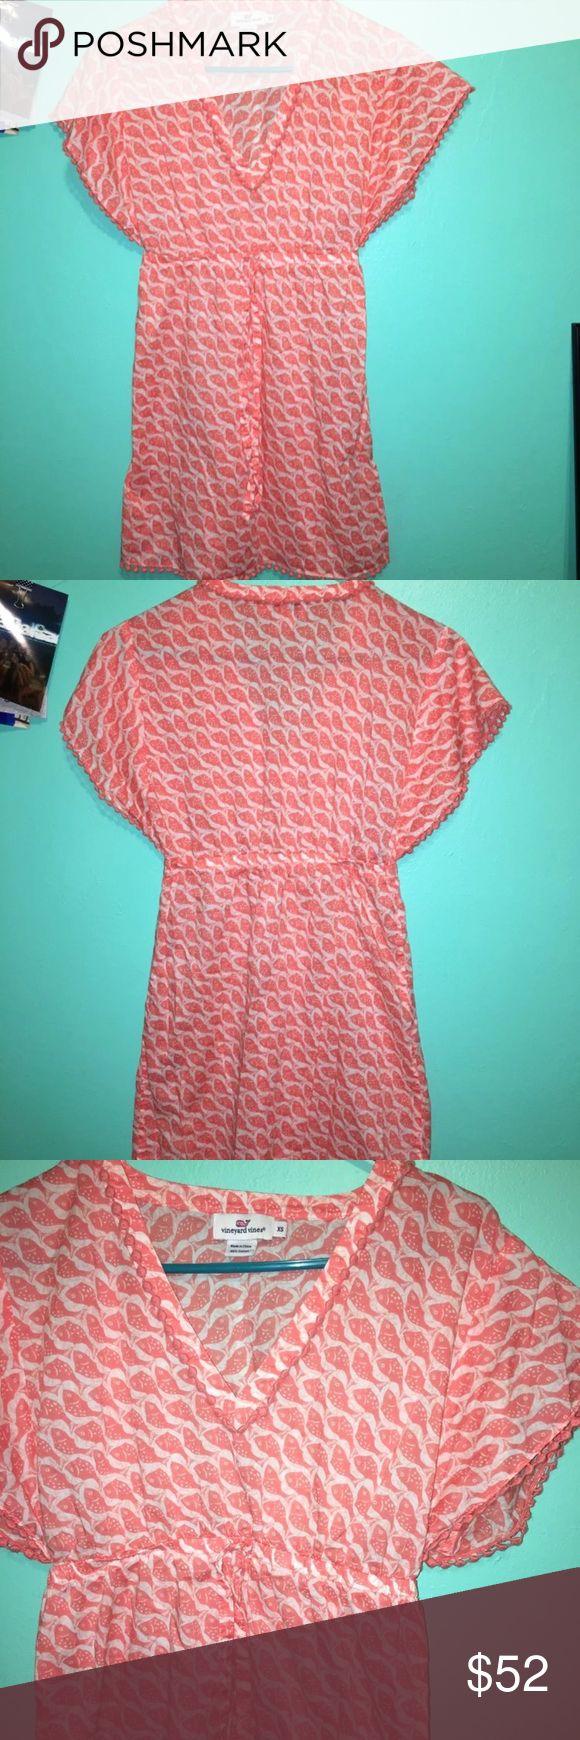 Flash Sale Vineyard Vines Swim Cover Up Like New Pom Pom Details  Throughout The Dress